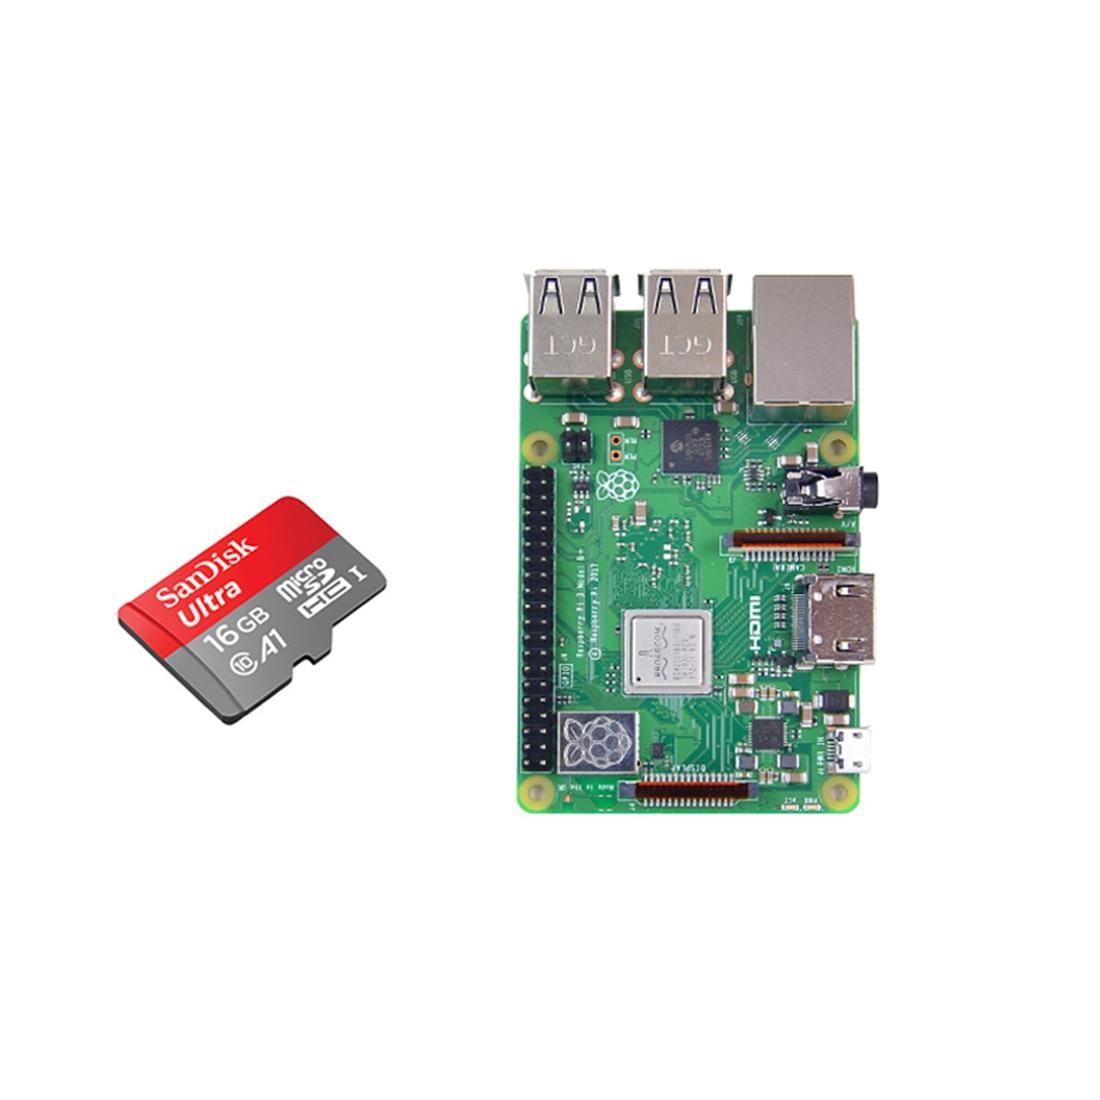 MODIKER Development Board With 16G Memory Card For Raspberry Pi 4 (1G OR 2G Running Memory)